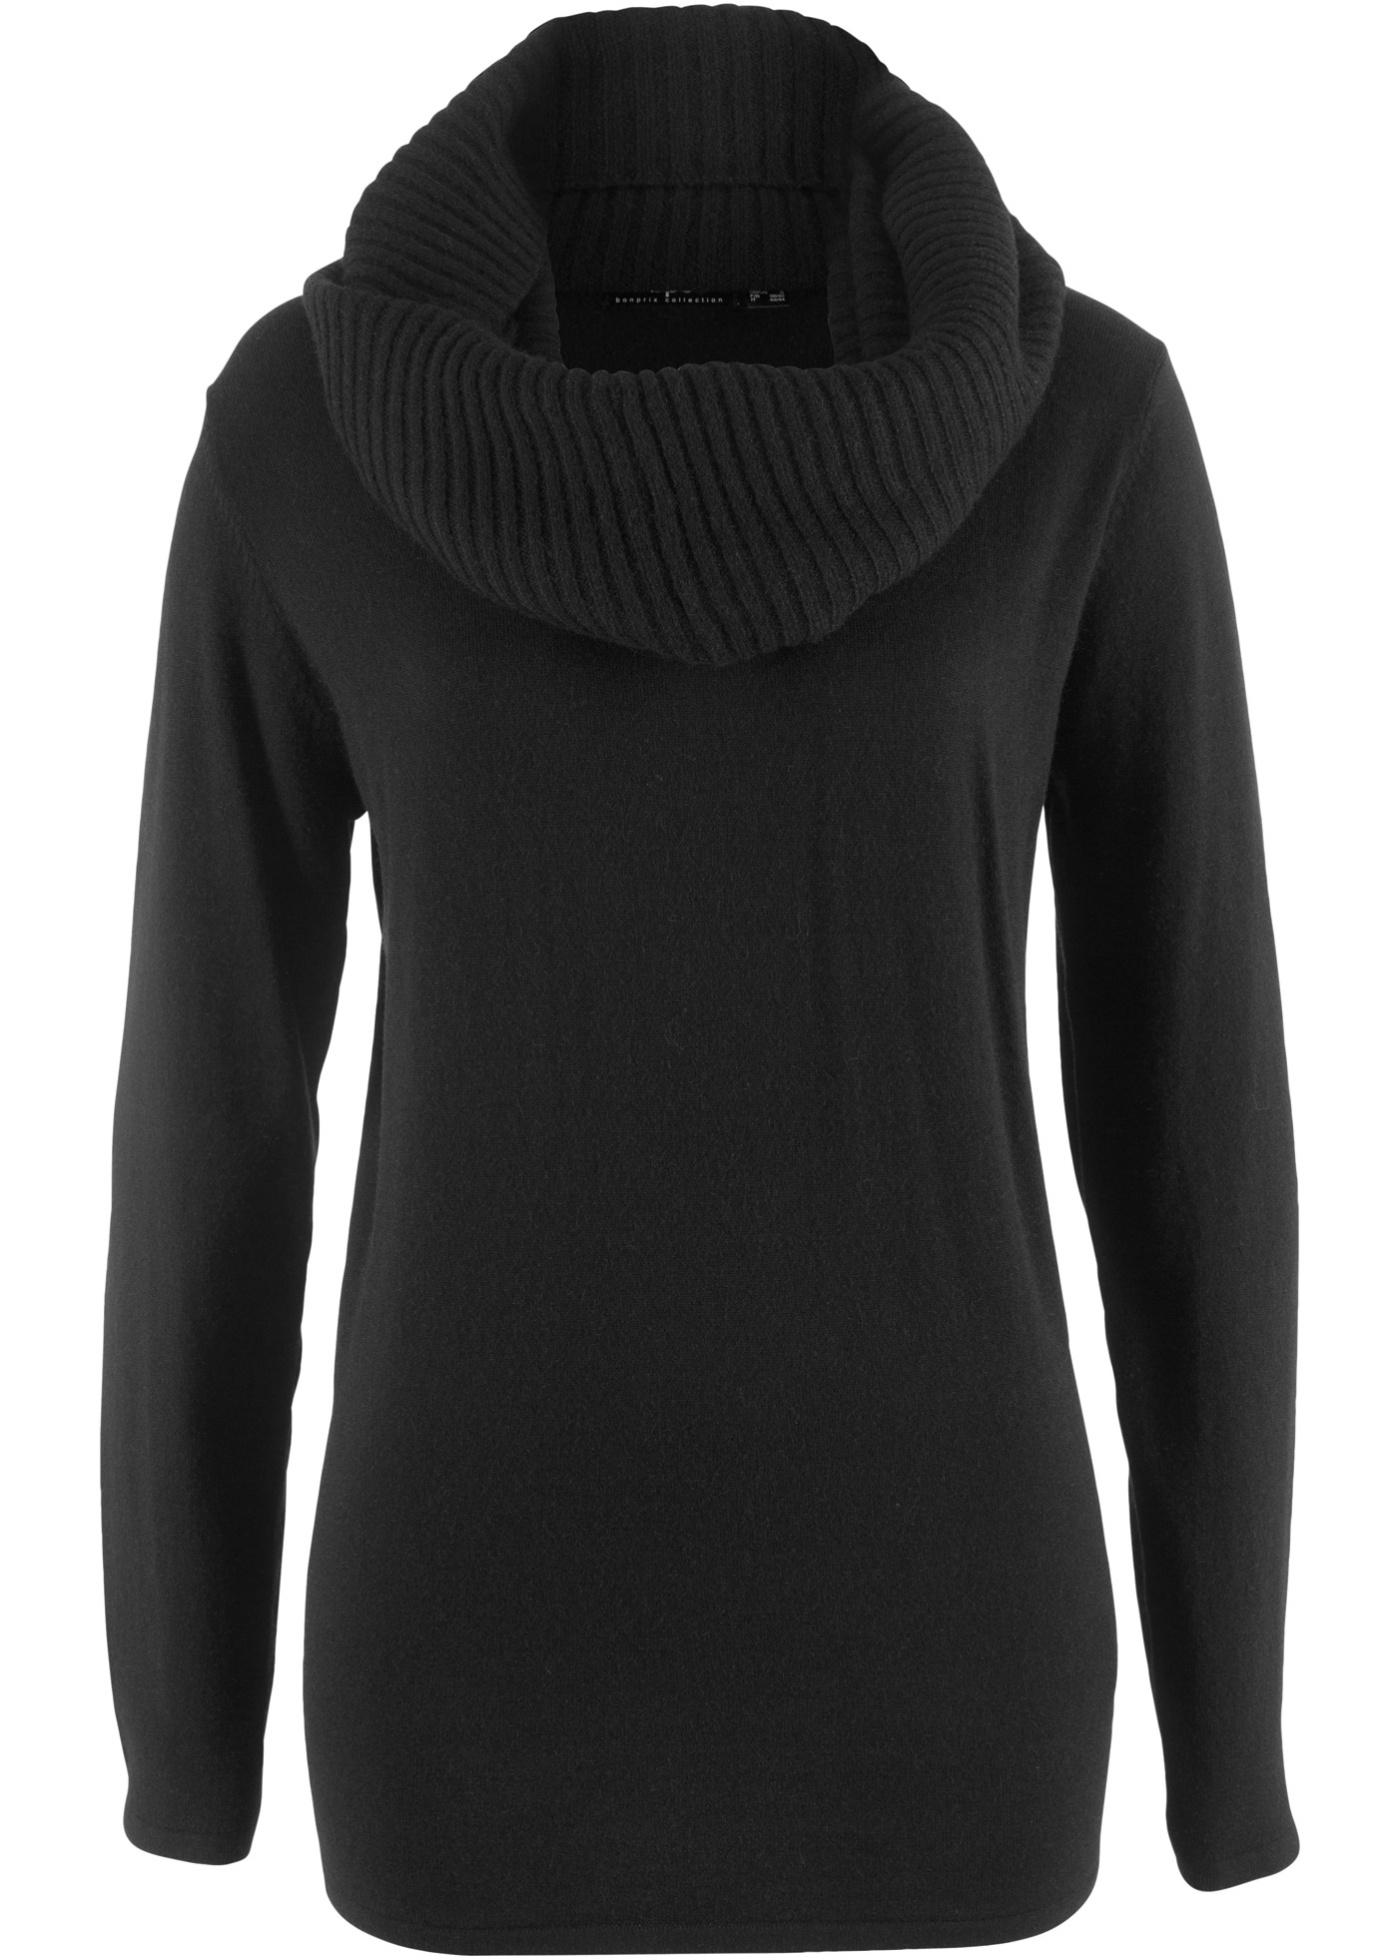 2in1 Long-Pullover mit Schal